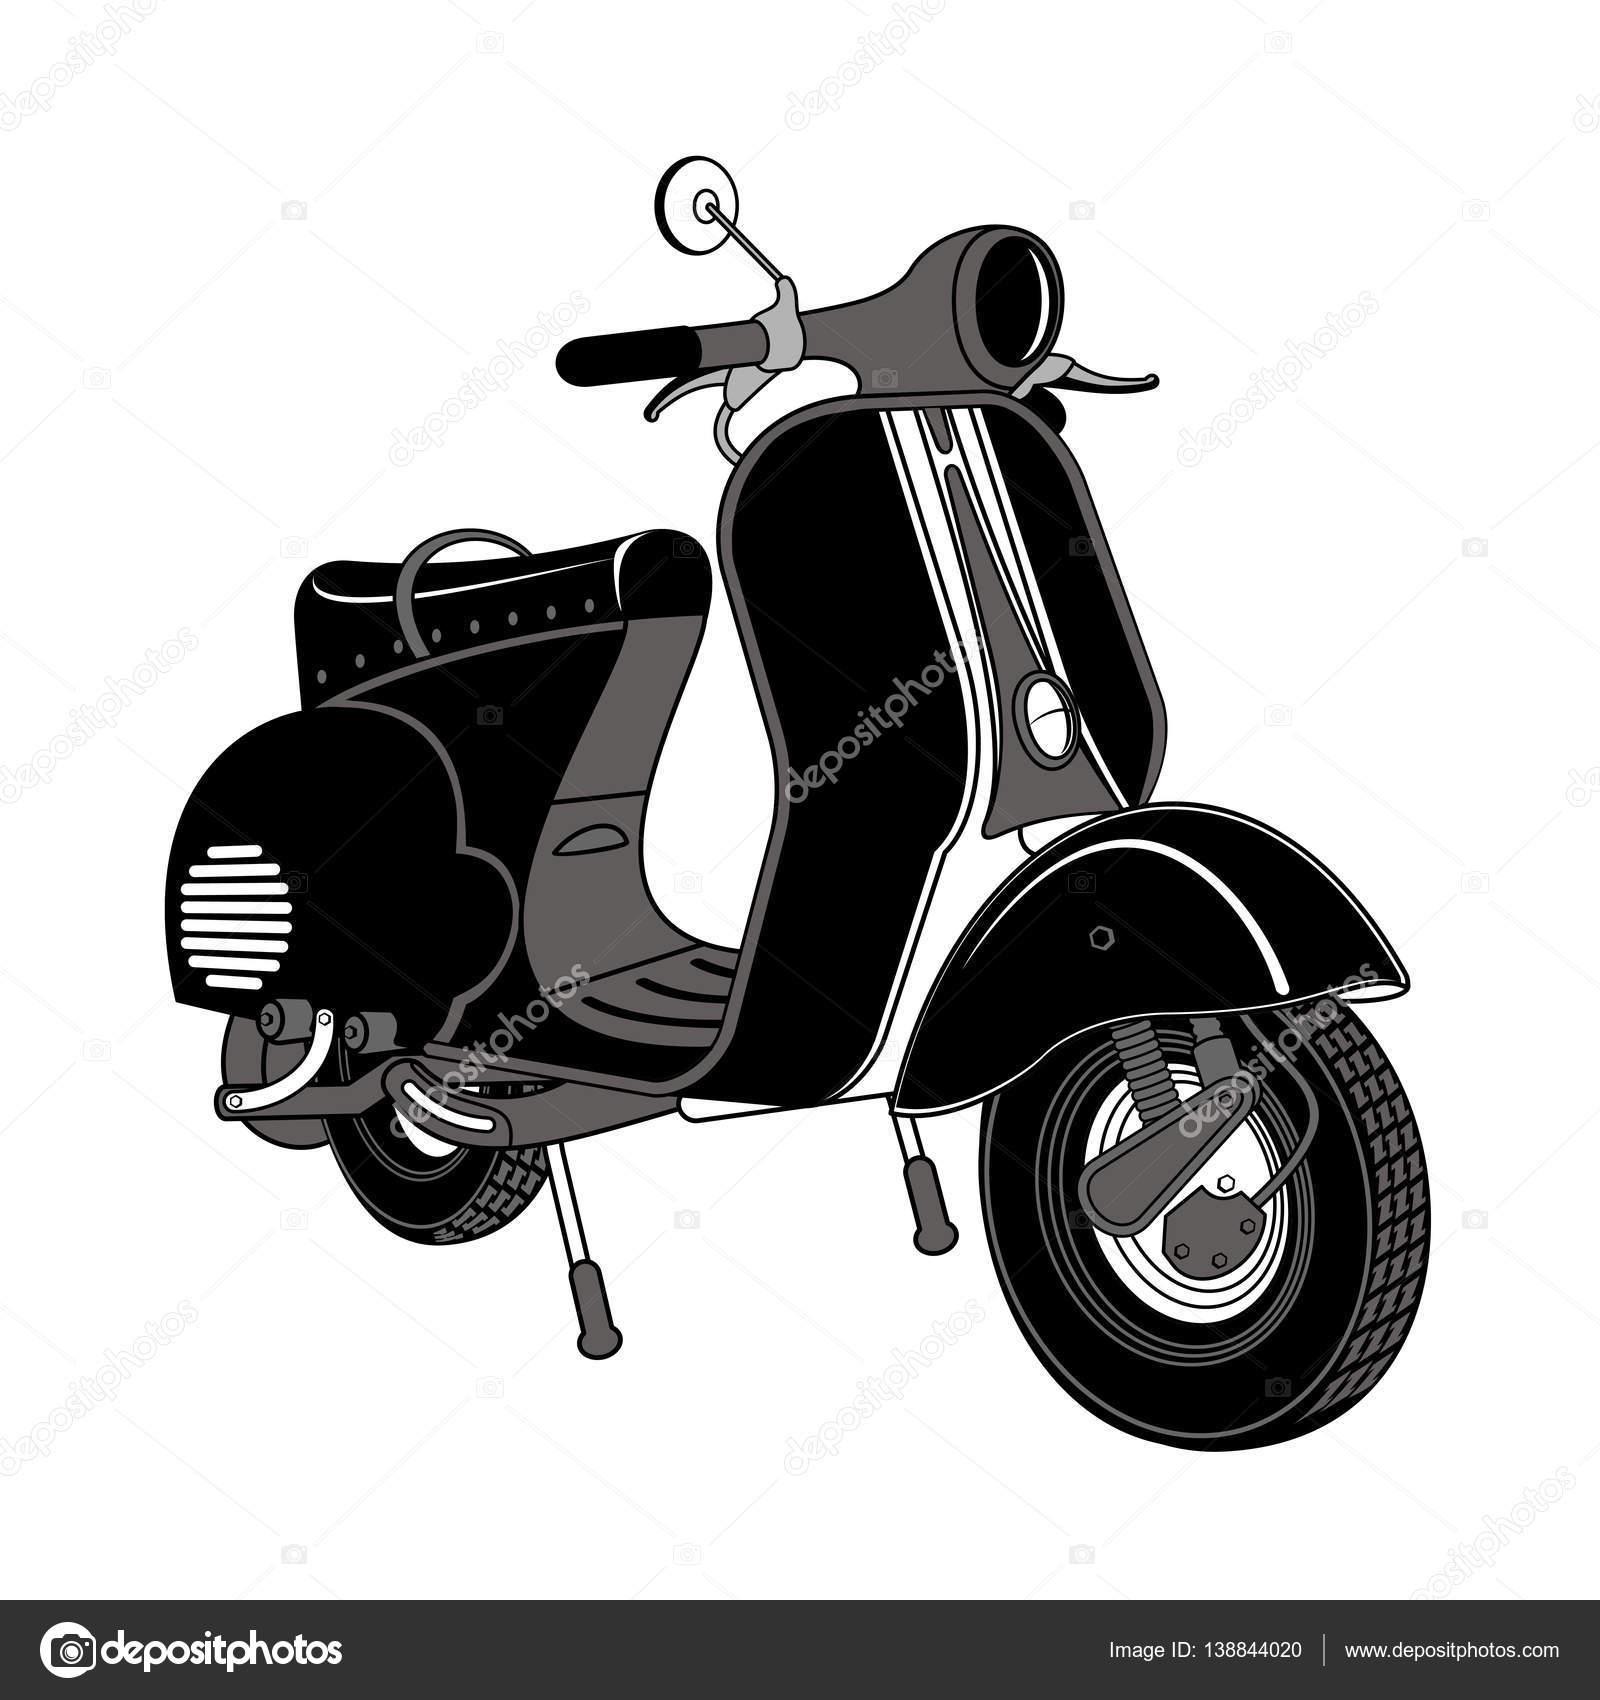 Vector Illustration Of Vintage Scooter Stock Vector C Samorodinov 138844020